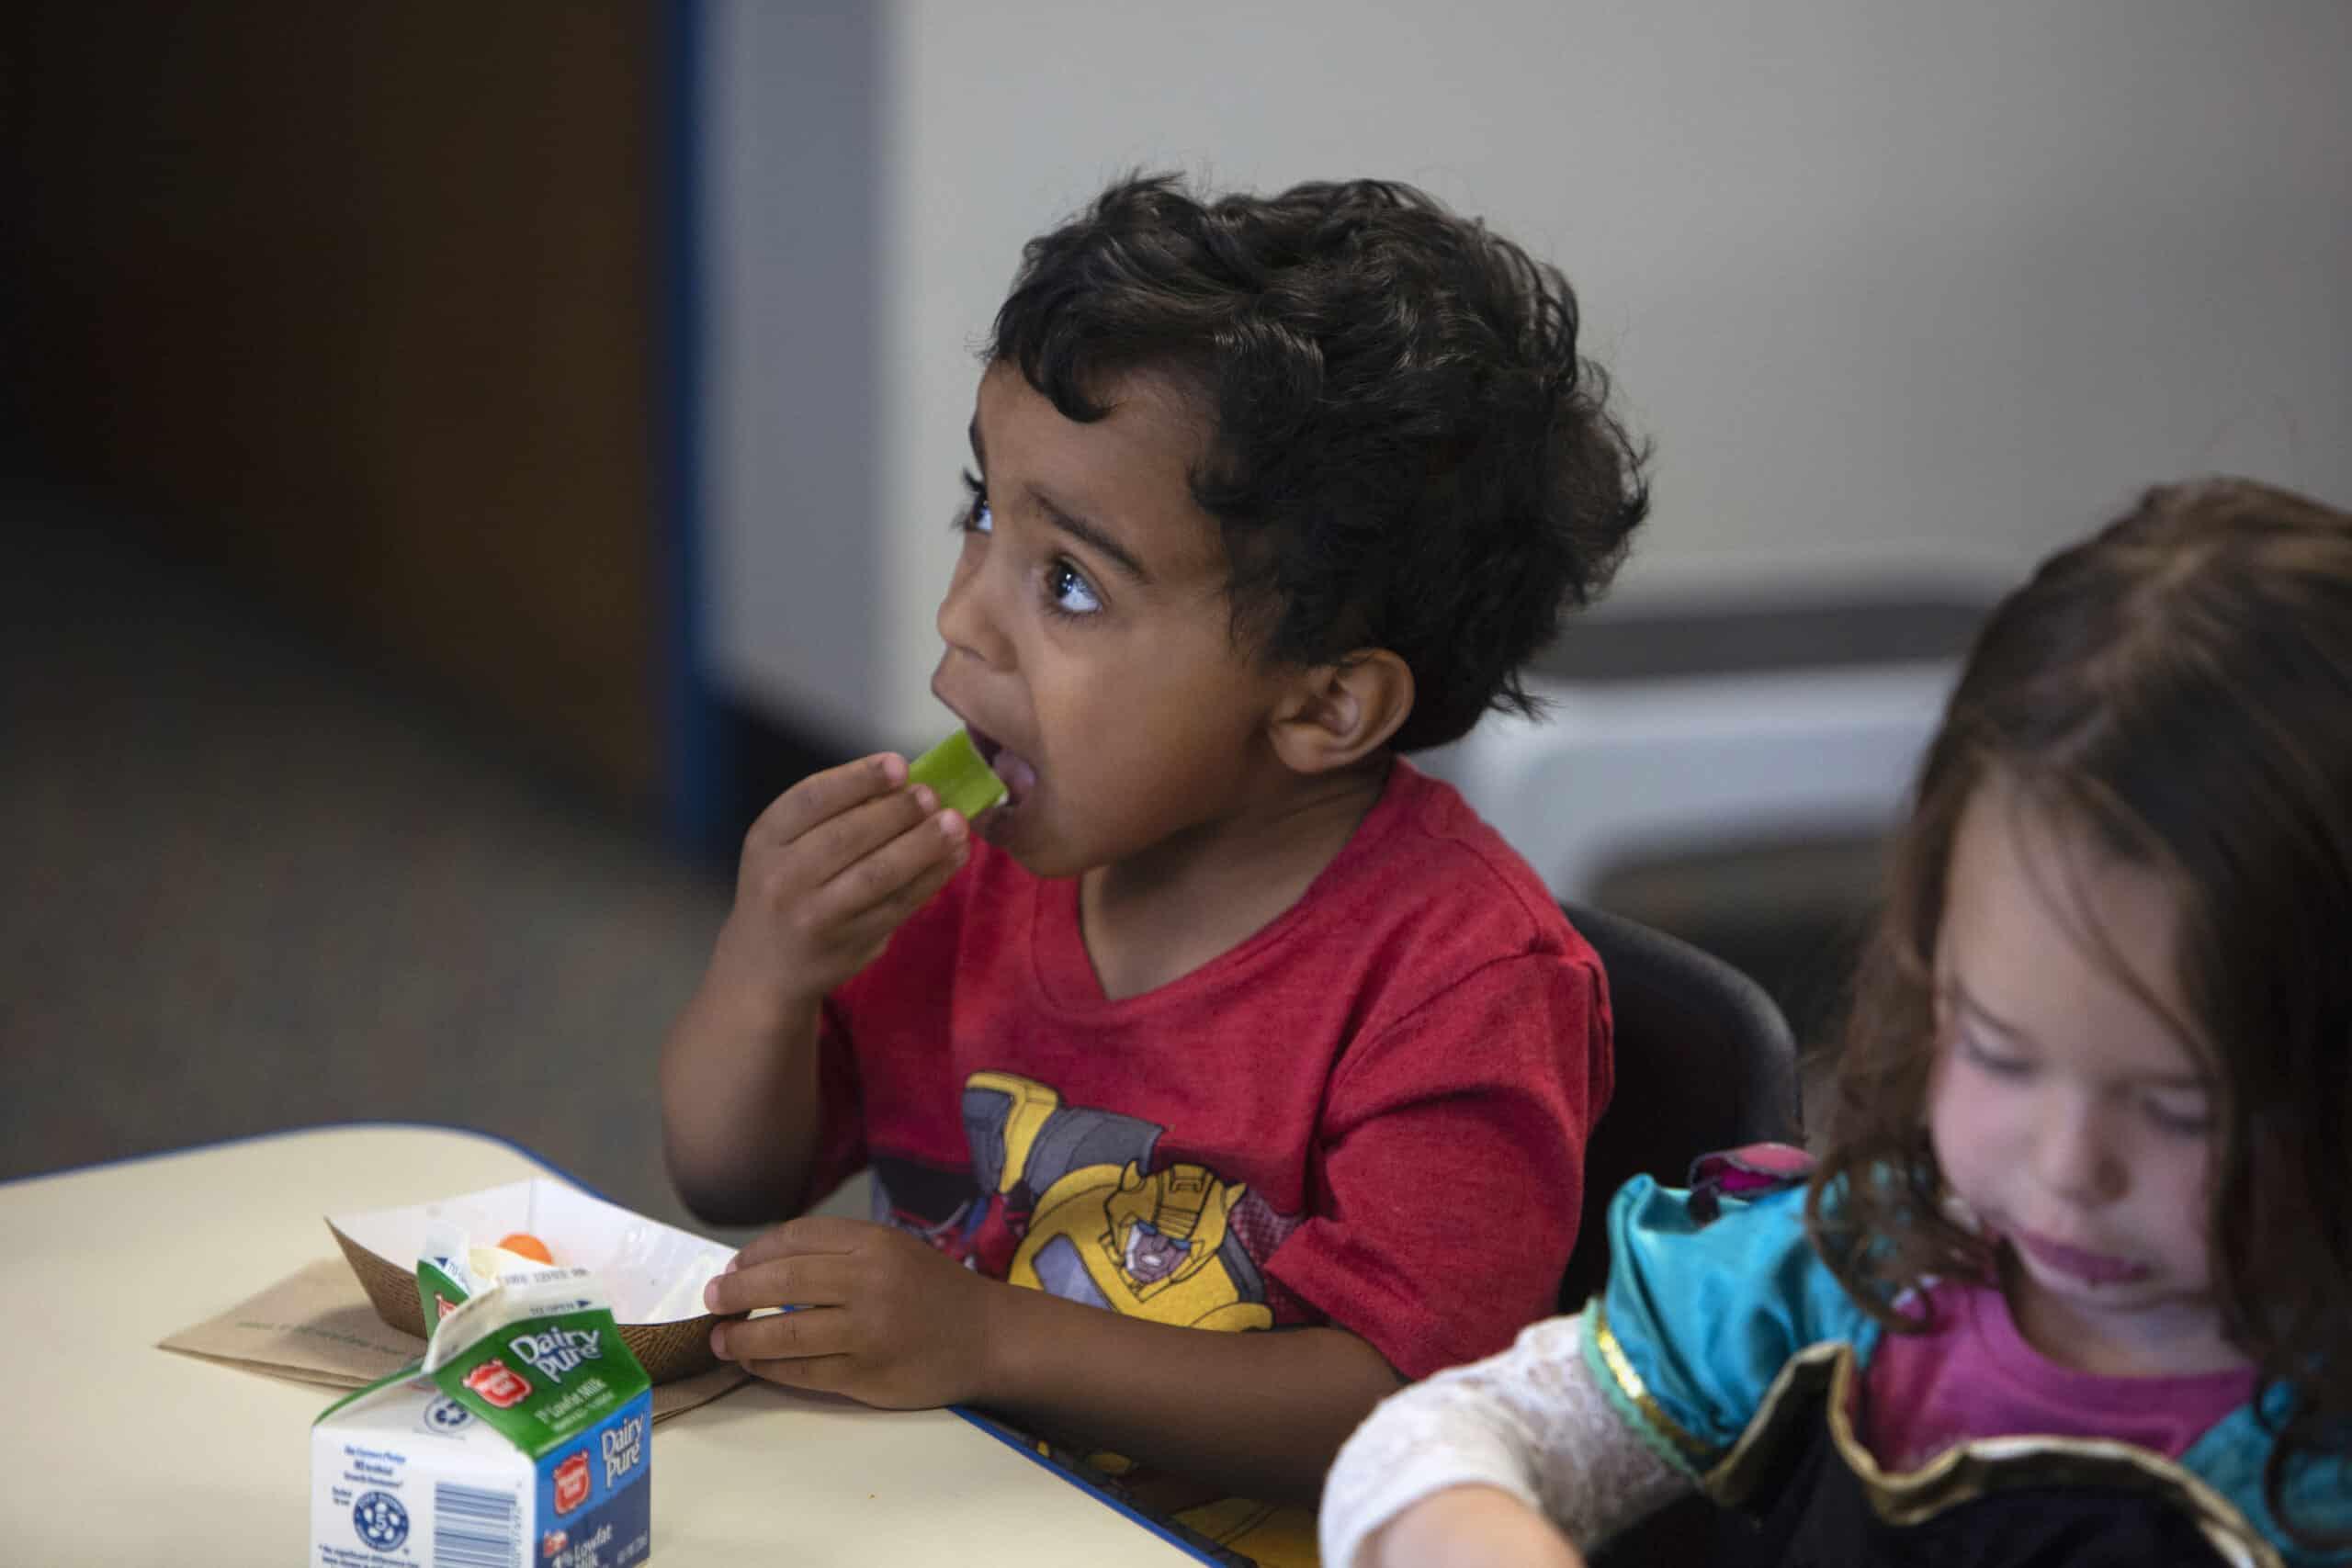 Preschool aged boy eating celery